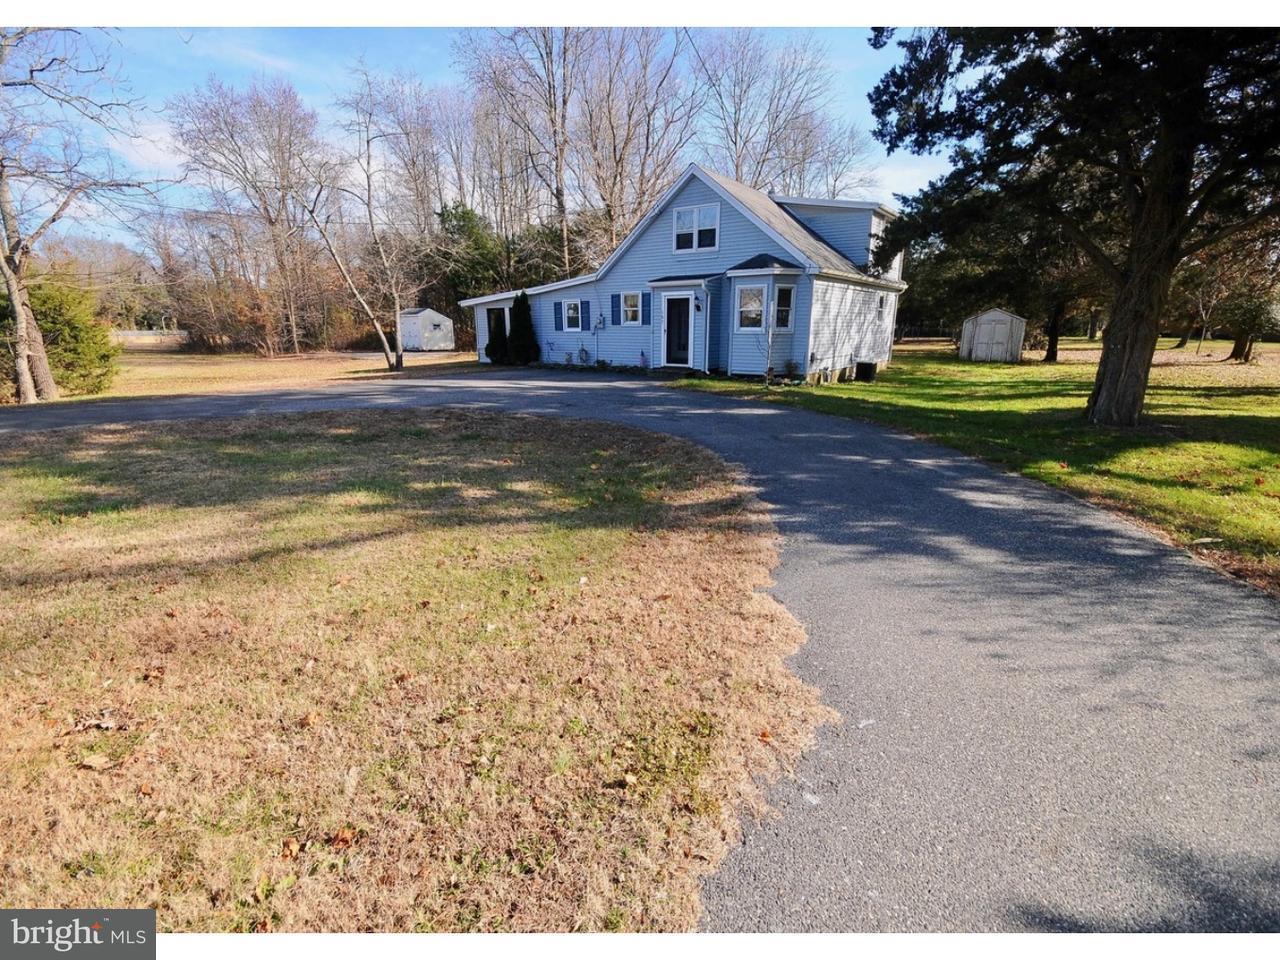 Single Family Home for Sale at 157 PORT ELIZABETH CUMB. Port Elizabeth, New Jersey 08332 United States